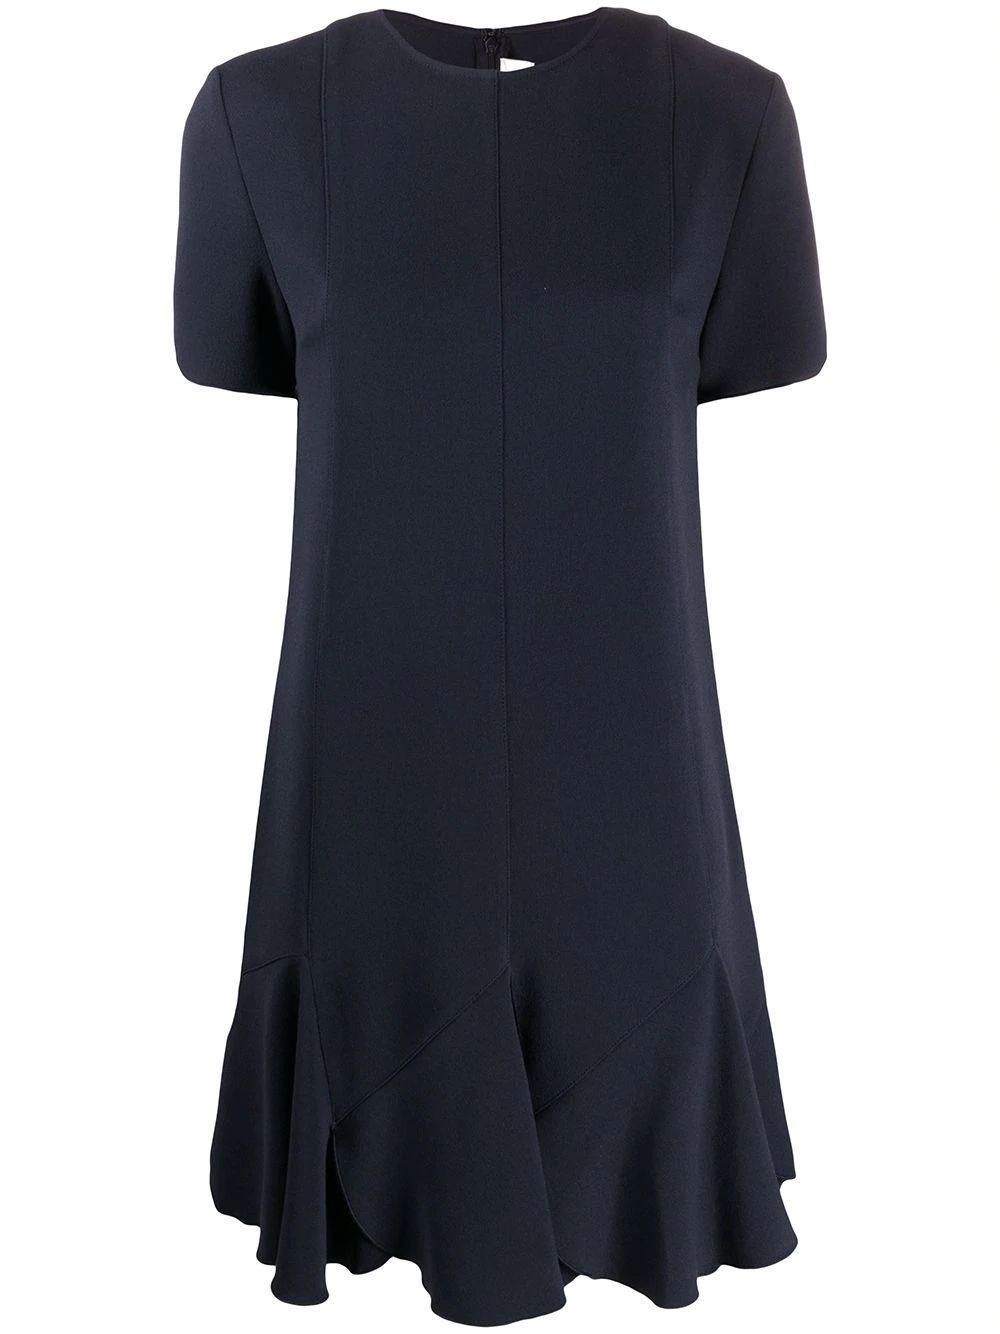 Flounce Hem Shift Dress Item # 2220WDR001025B